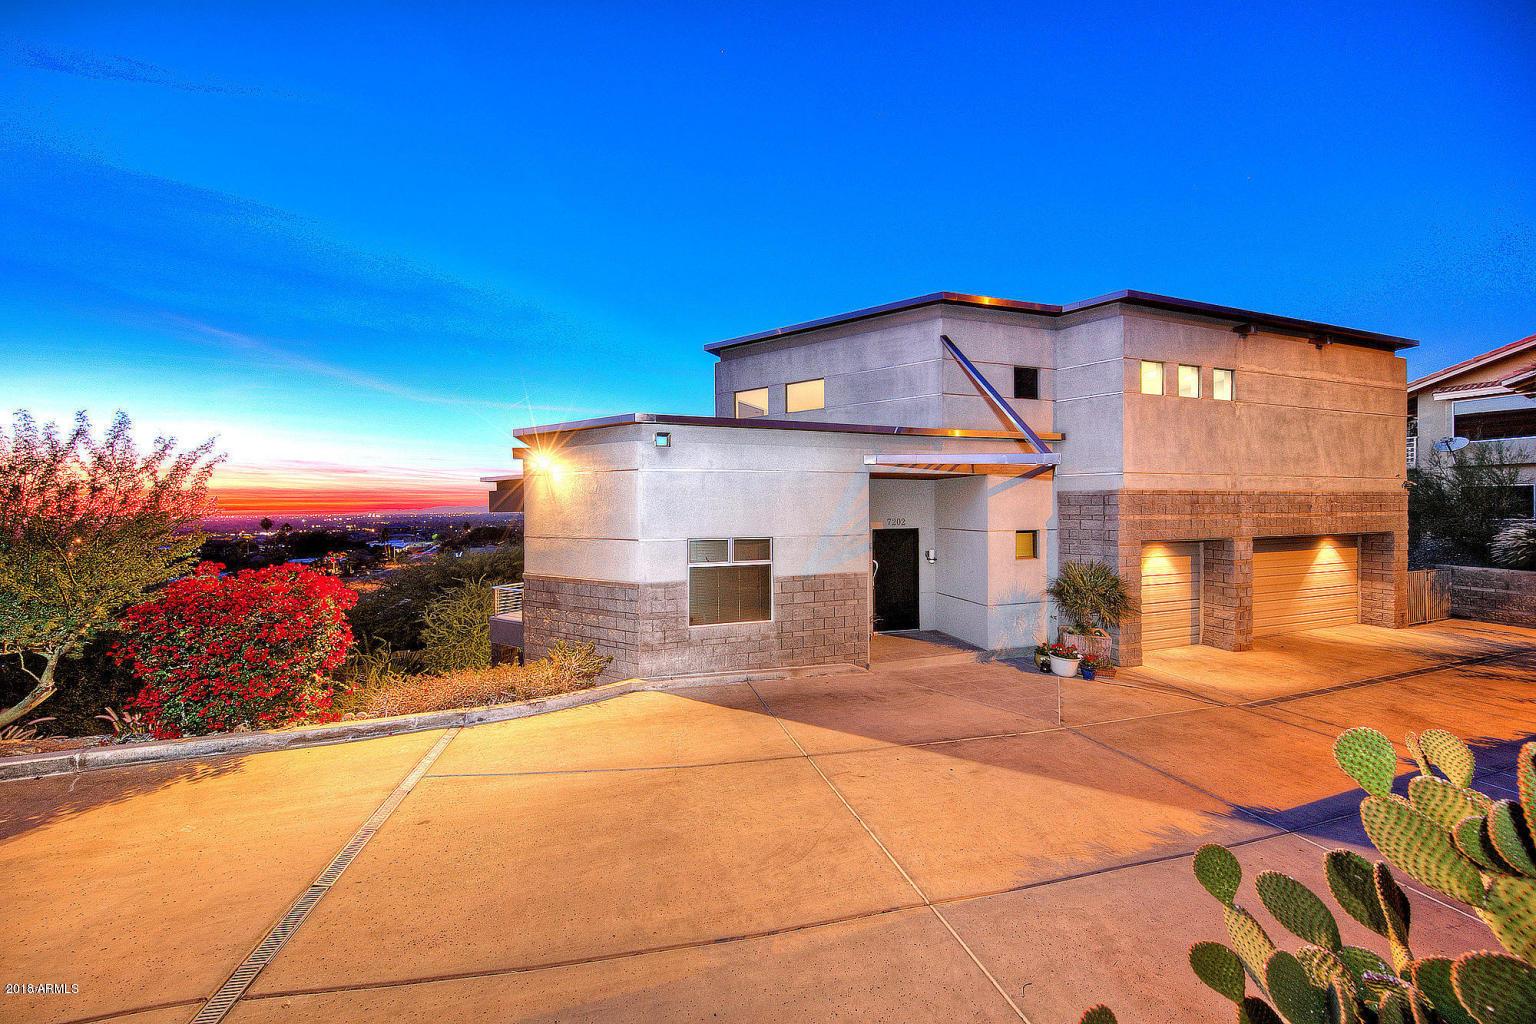 MLS 5906240 7202 N 23RD Place, Phoenix, AZ 85020 Homes w/Views in Phoenix